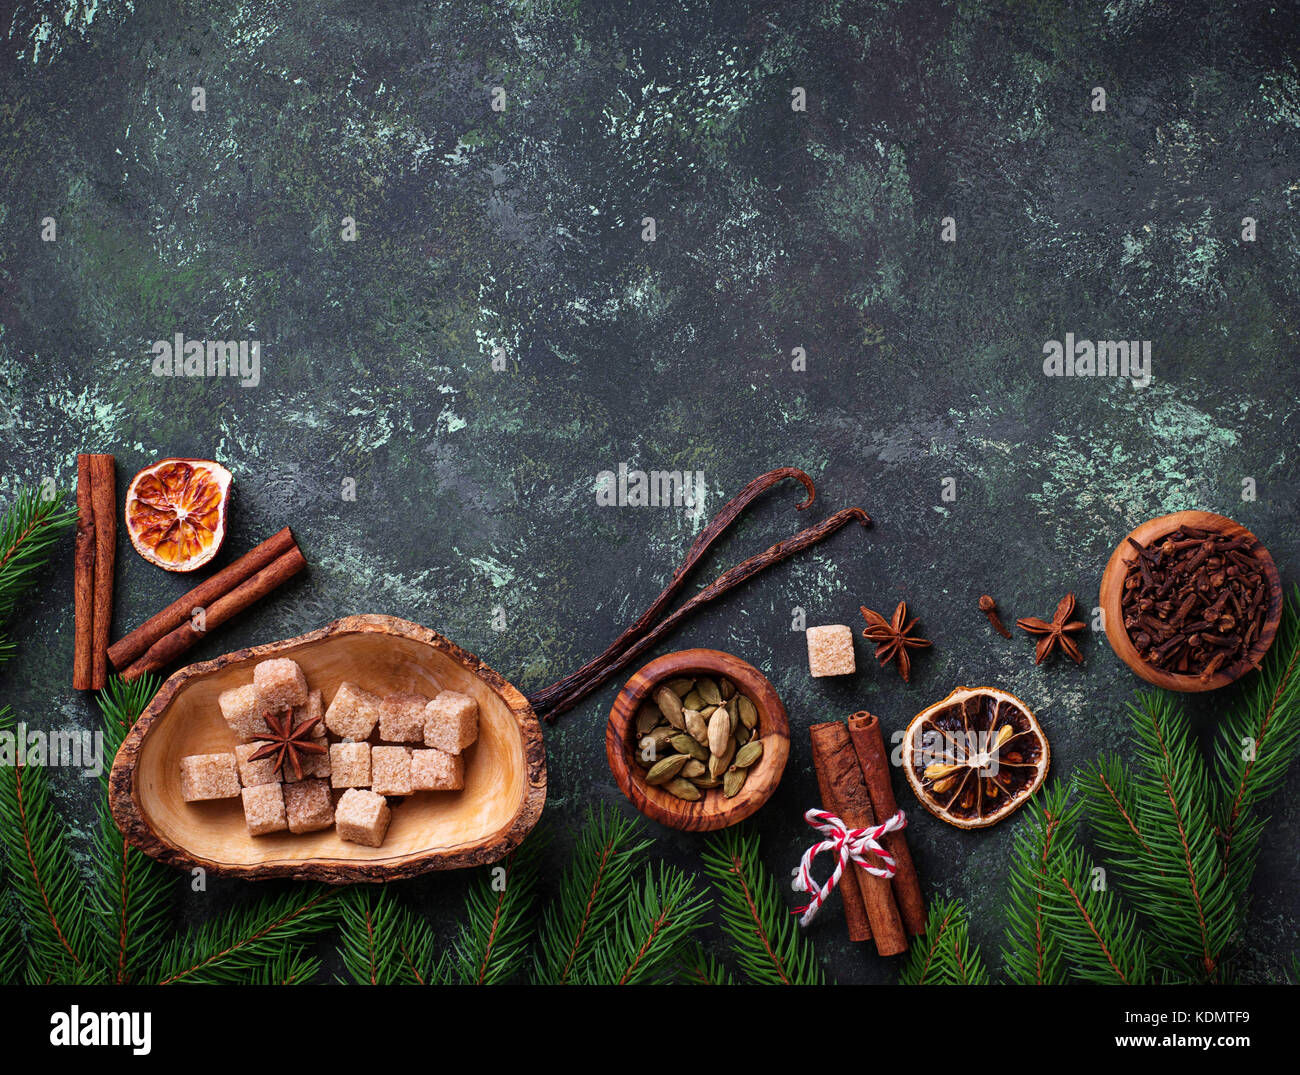 aromatic stockfotos aromatic bilder alamy. Black Bedroom Furniture Sets. Home Design Ideas